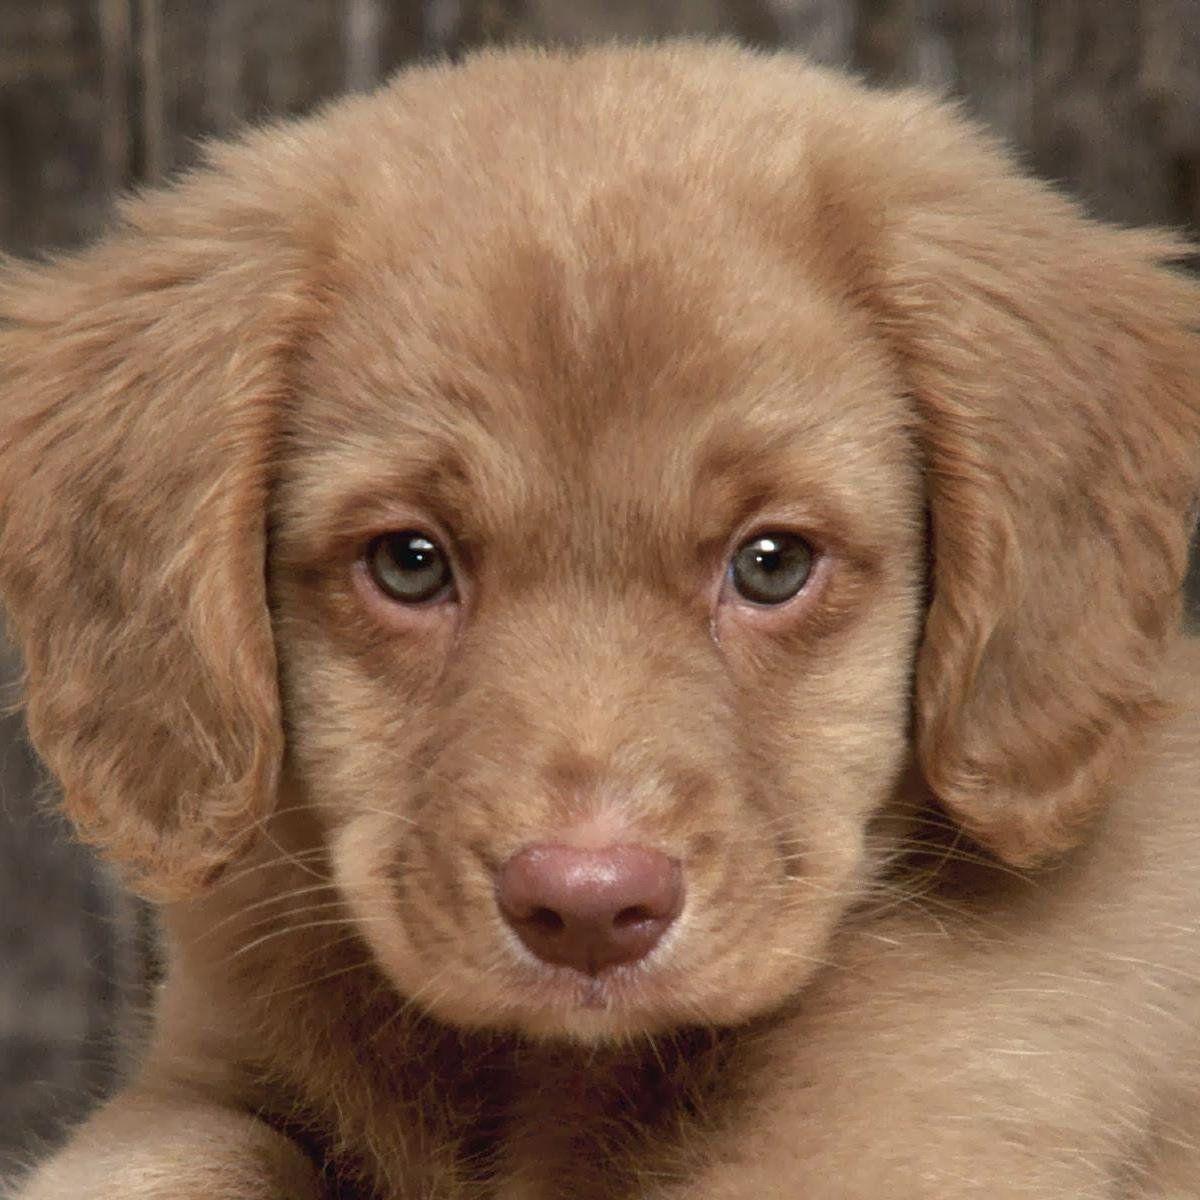 Chocolate Labrador Retriever Puppy With Blue Eyes Baby Puppies Golden Cocker Retriever Cute Puppy Pictures